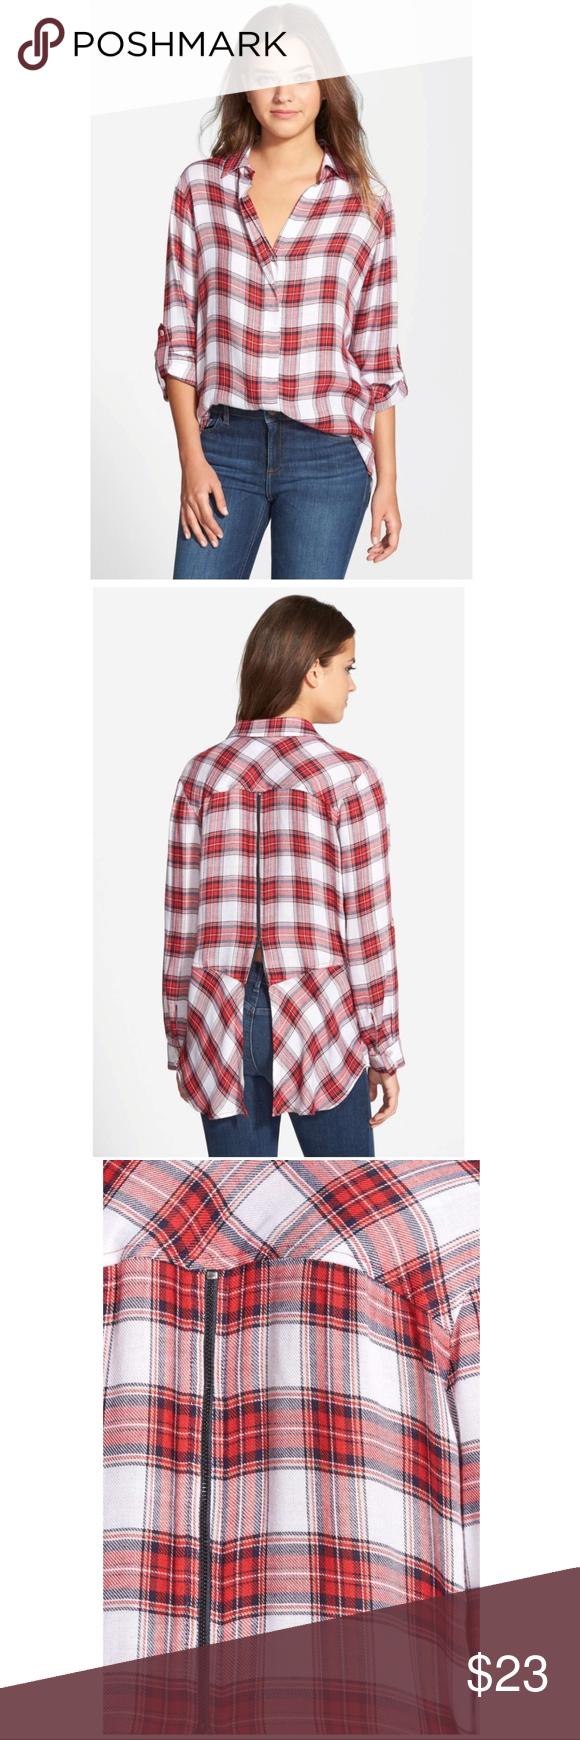 69b16fdfdb6d4 EUC Sam Edelman zip-back plaid shirt sz XS Sam Edelman ‼